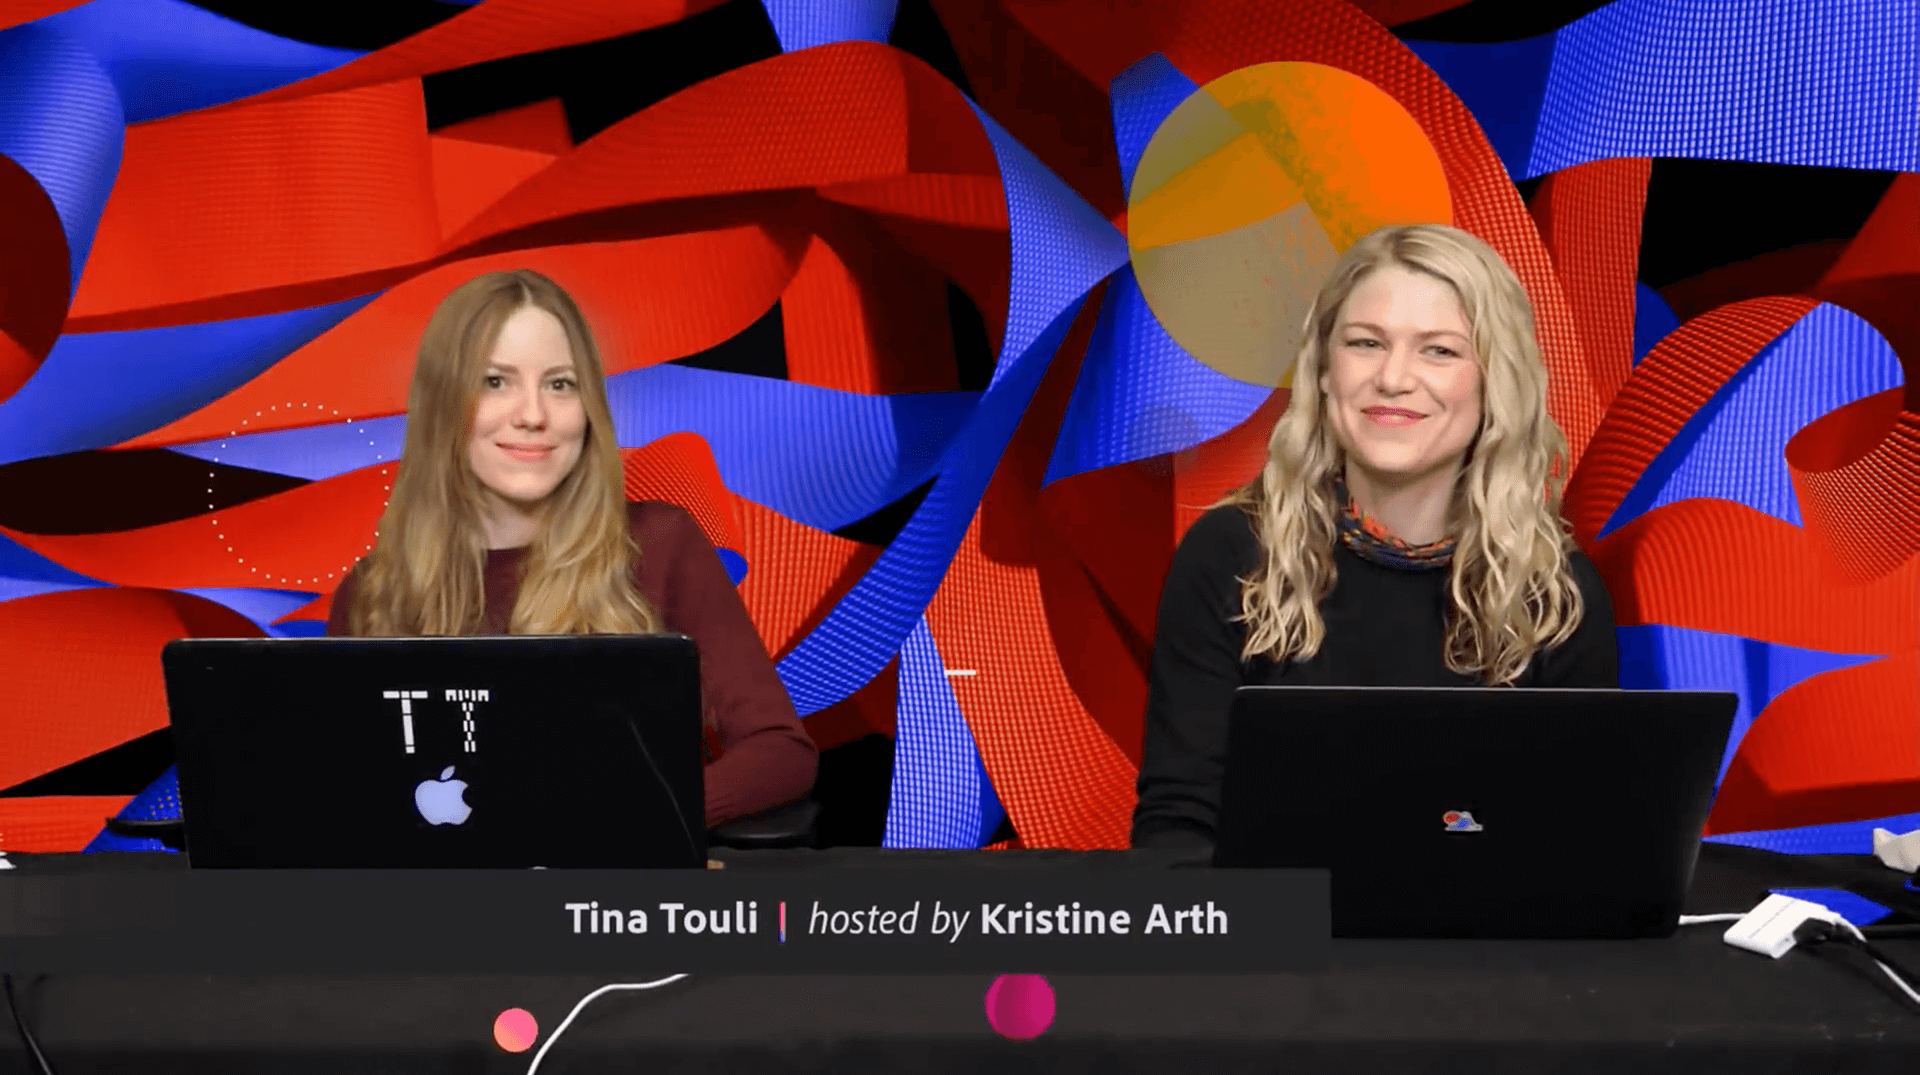 Designer Interview With Tina Touli